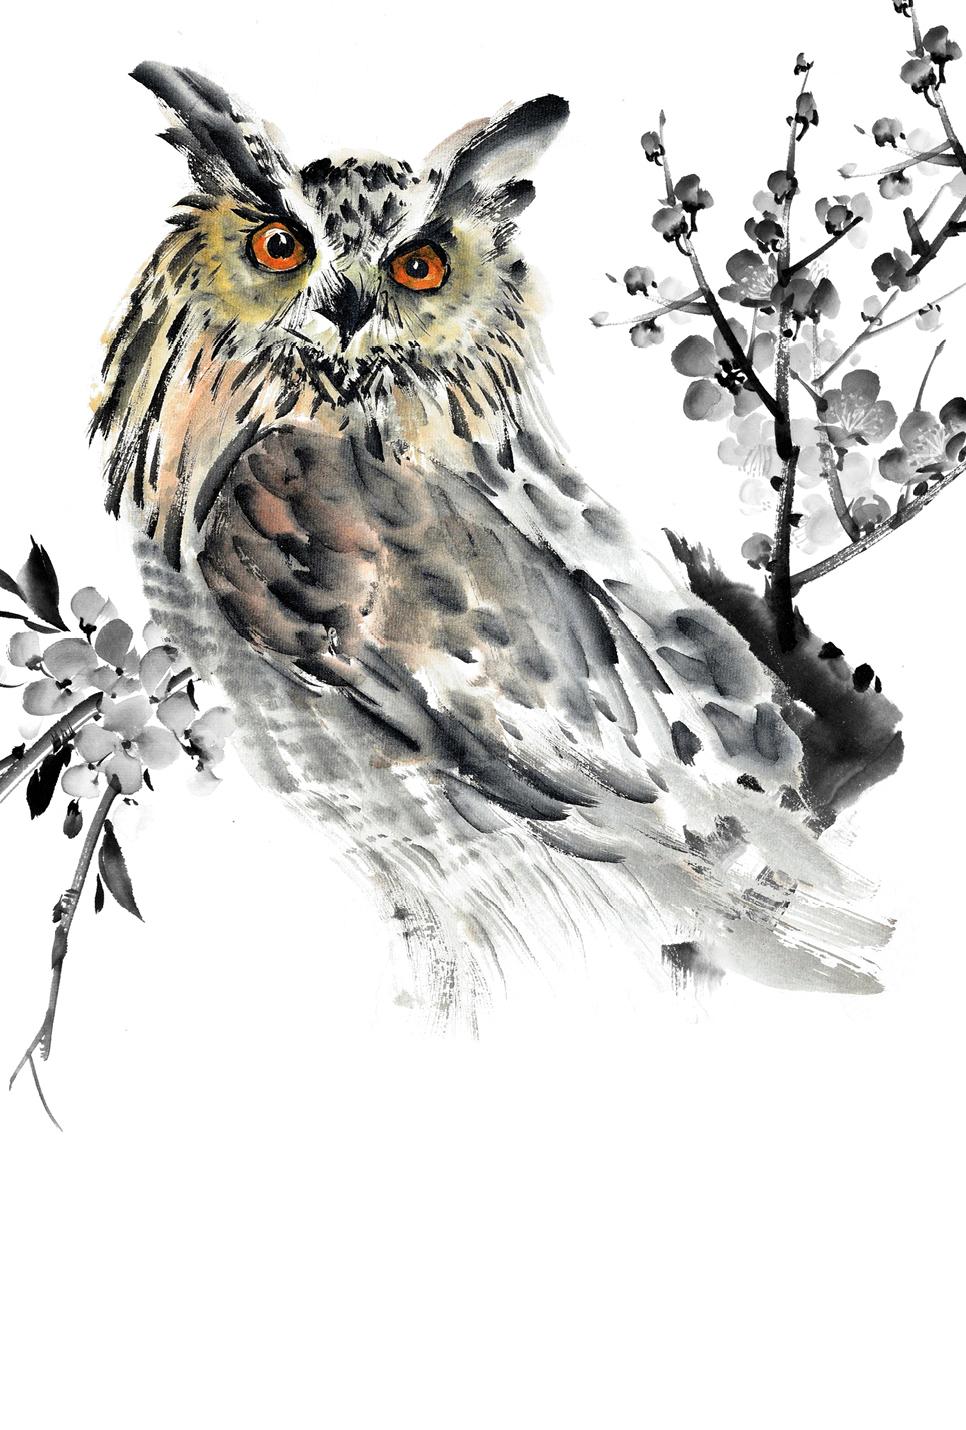 Японская живопись суми-э. Филин. Блокнот mini эксмо магнитные японская живопись совы